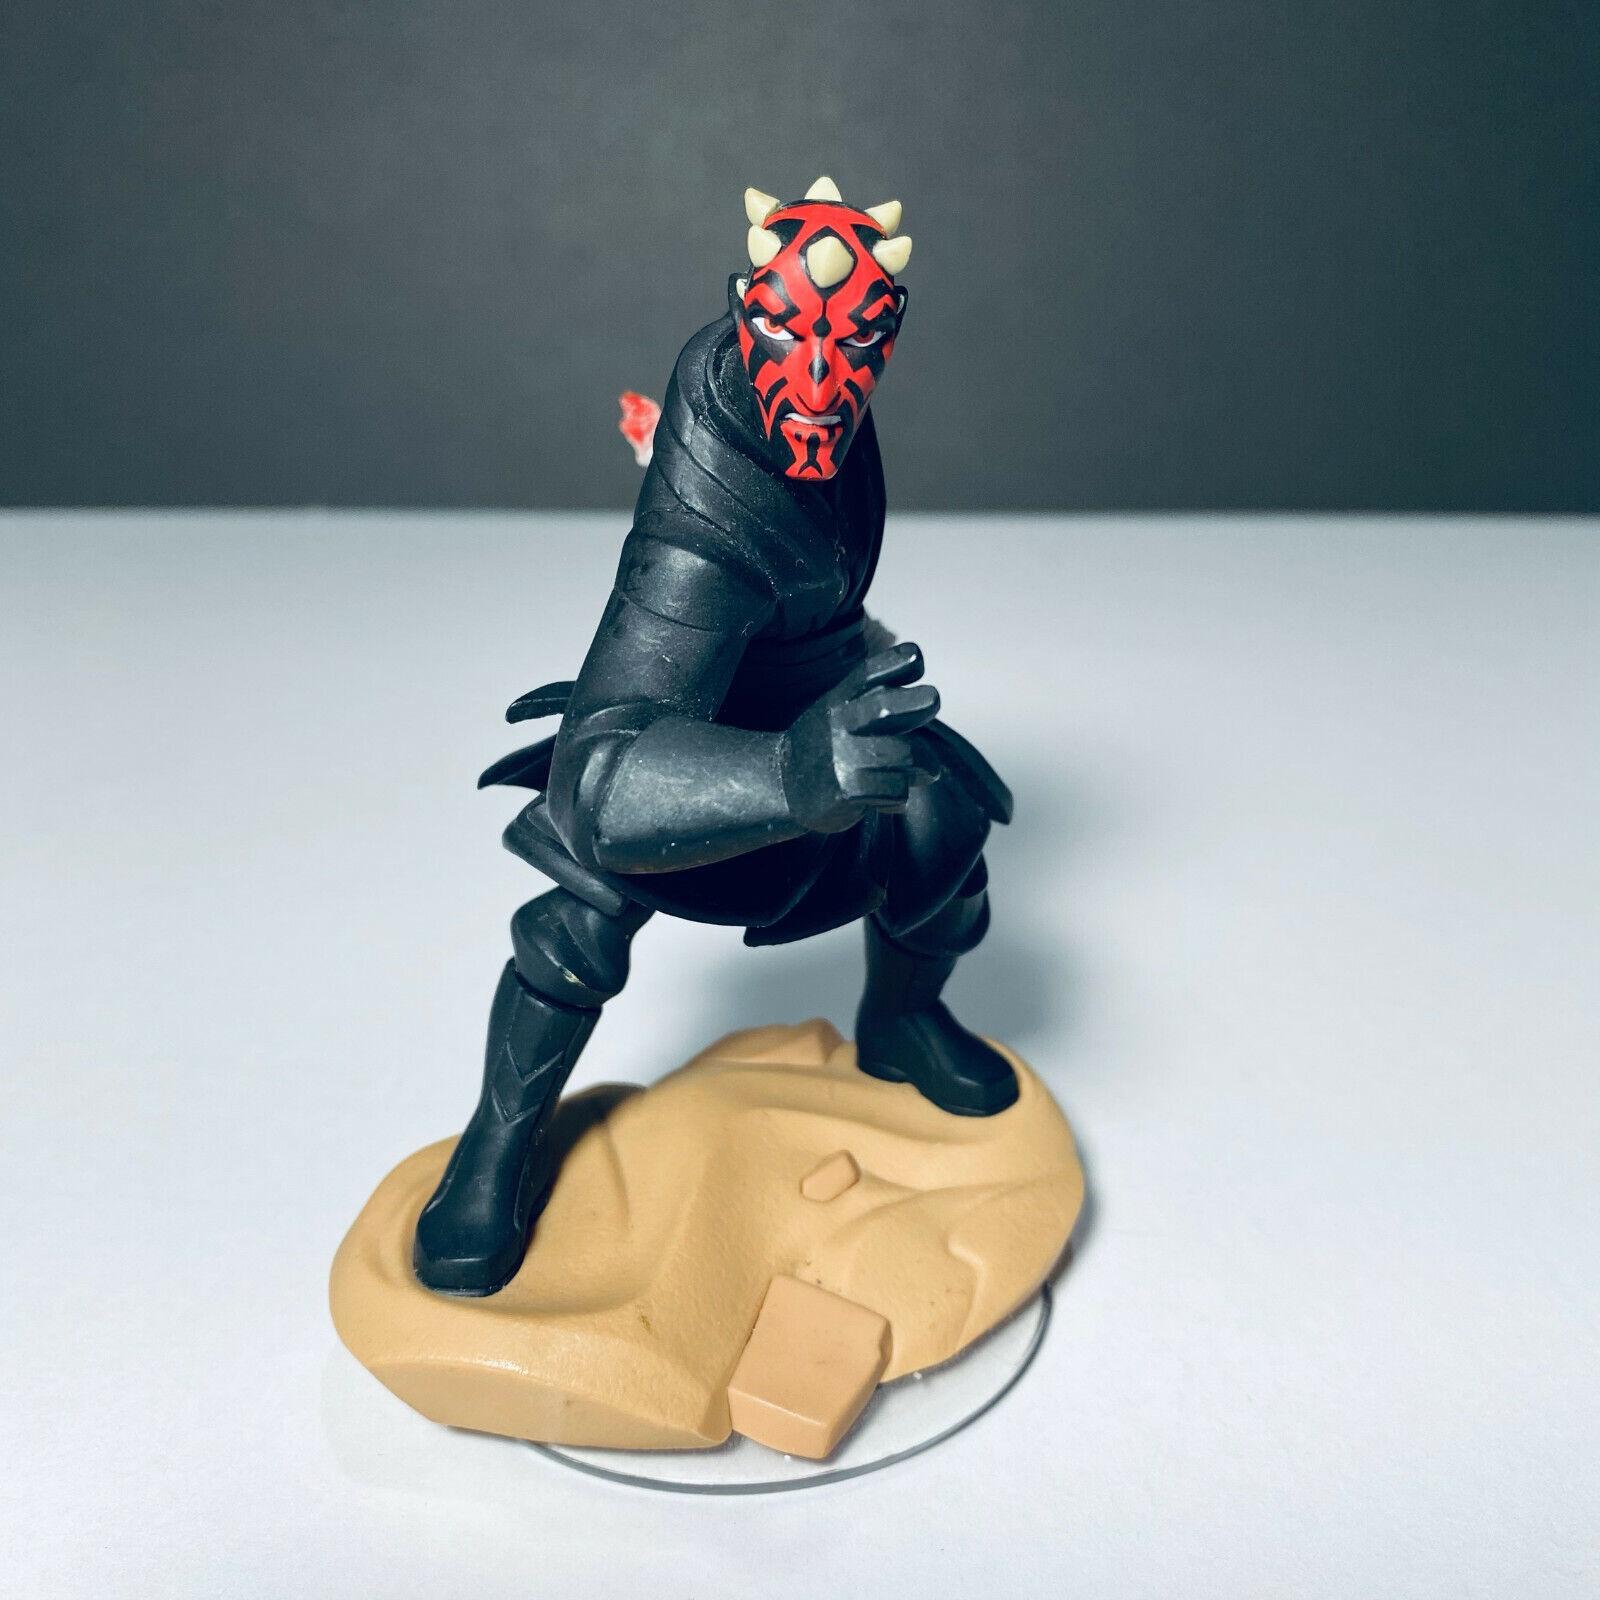 Disney Infinity 3.0 Figure Star Wars Darth Maul Broken Light Saber